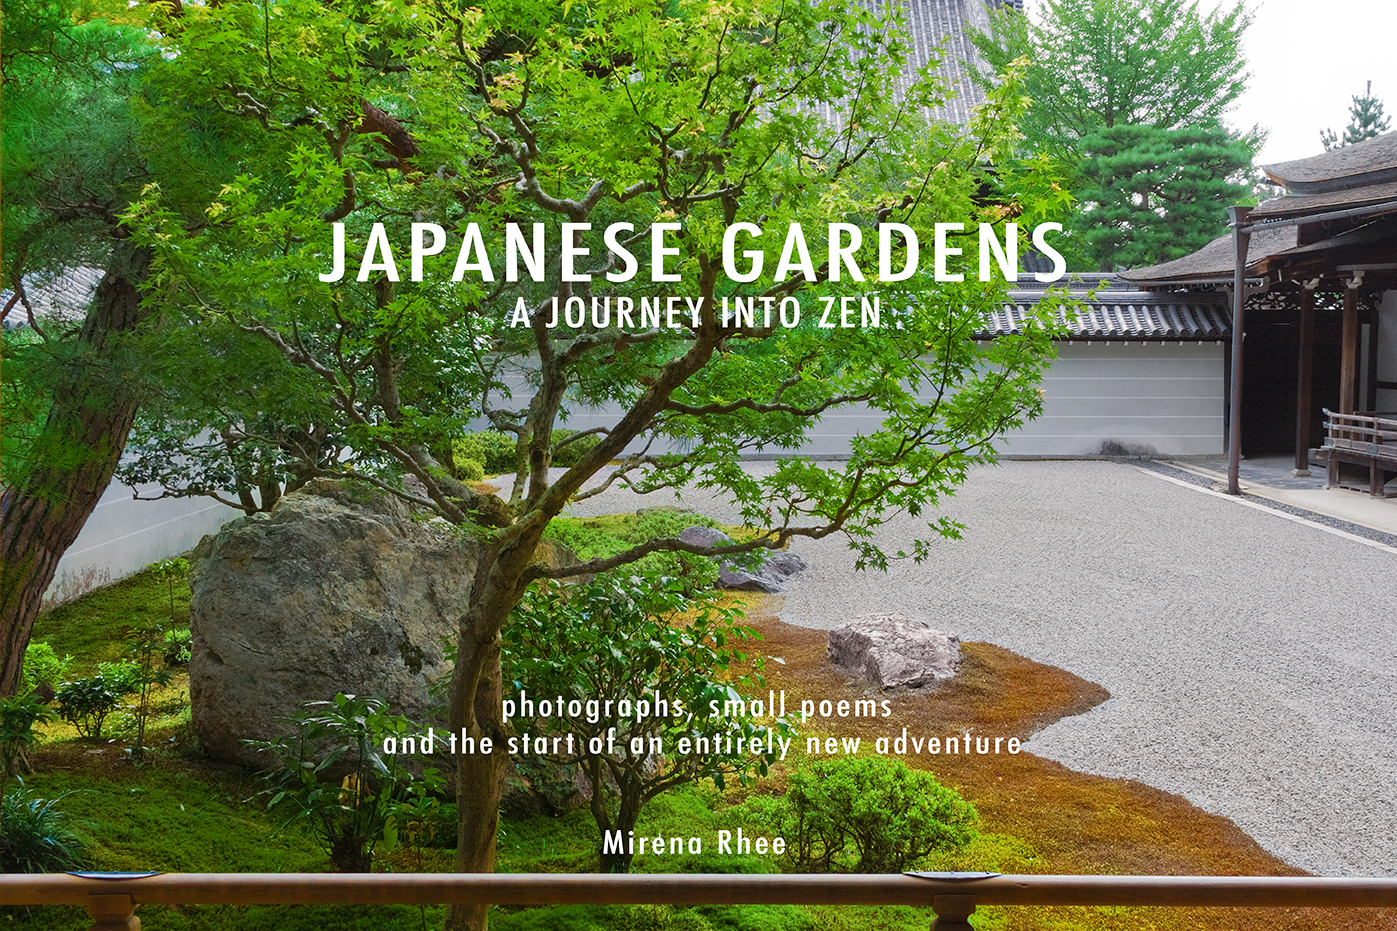 mirena-rhee-book-photographs-poems-japanese-gardens-a-journey-into-zen_01.jpg